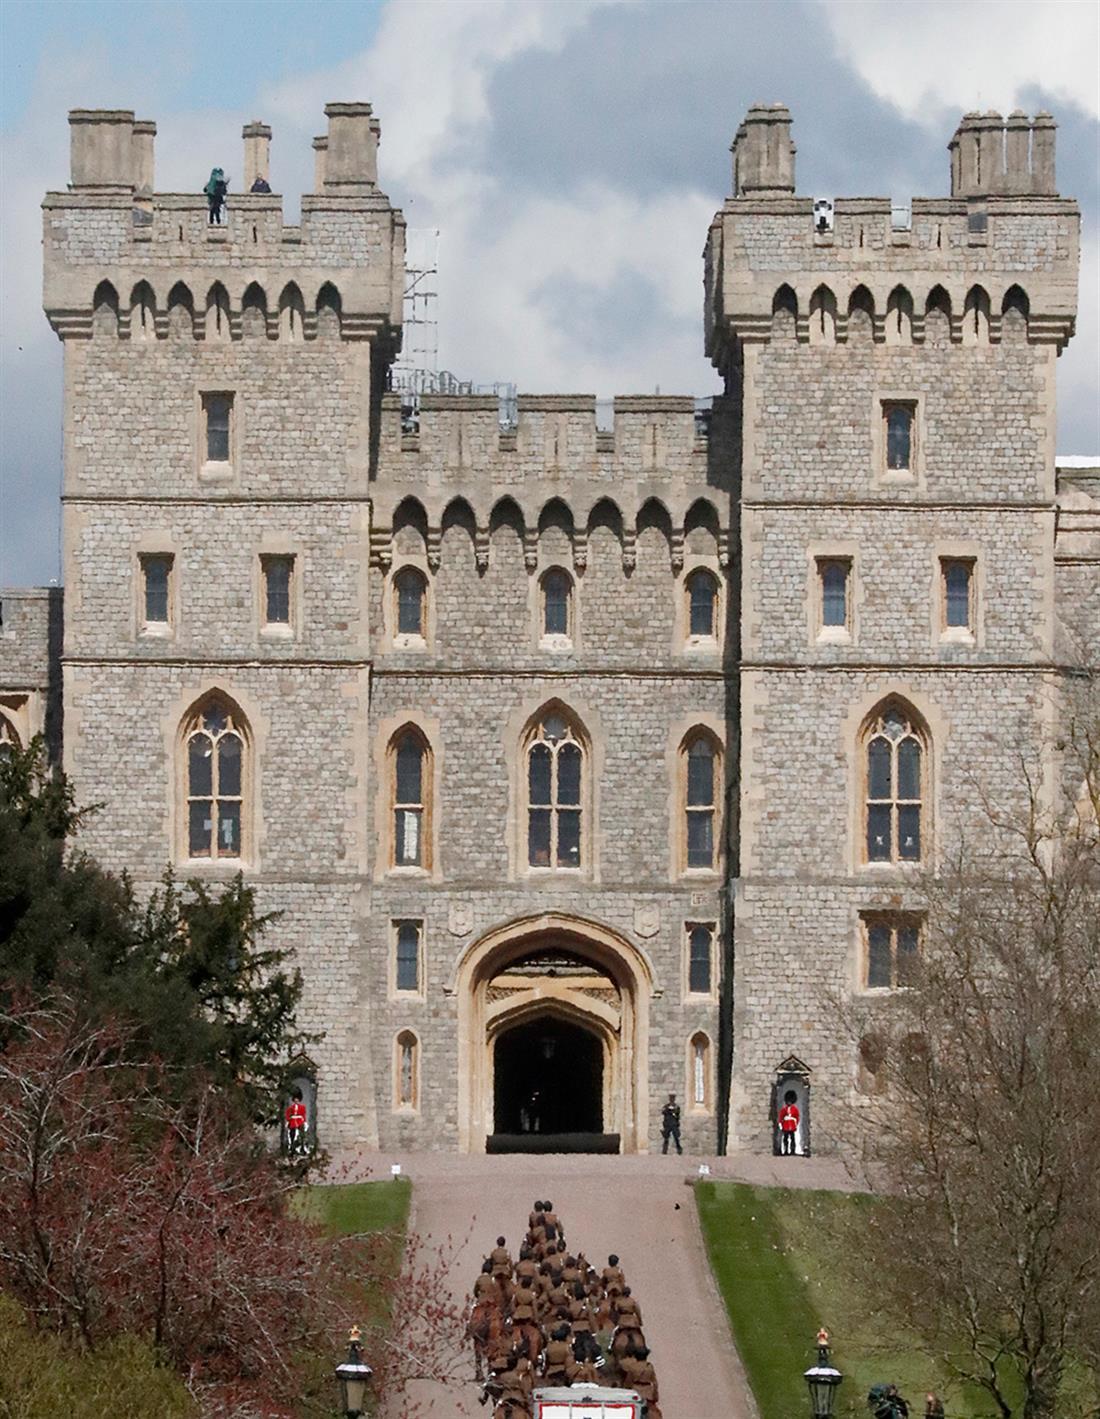 AP - Πρίγκιπας Φίλιππος - κηδεία - Κάστρο του Windsor - Μεγάλη Βρετανία